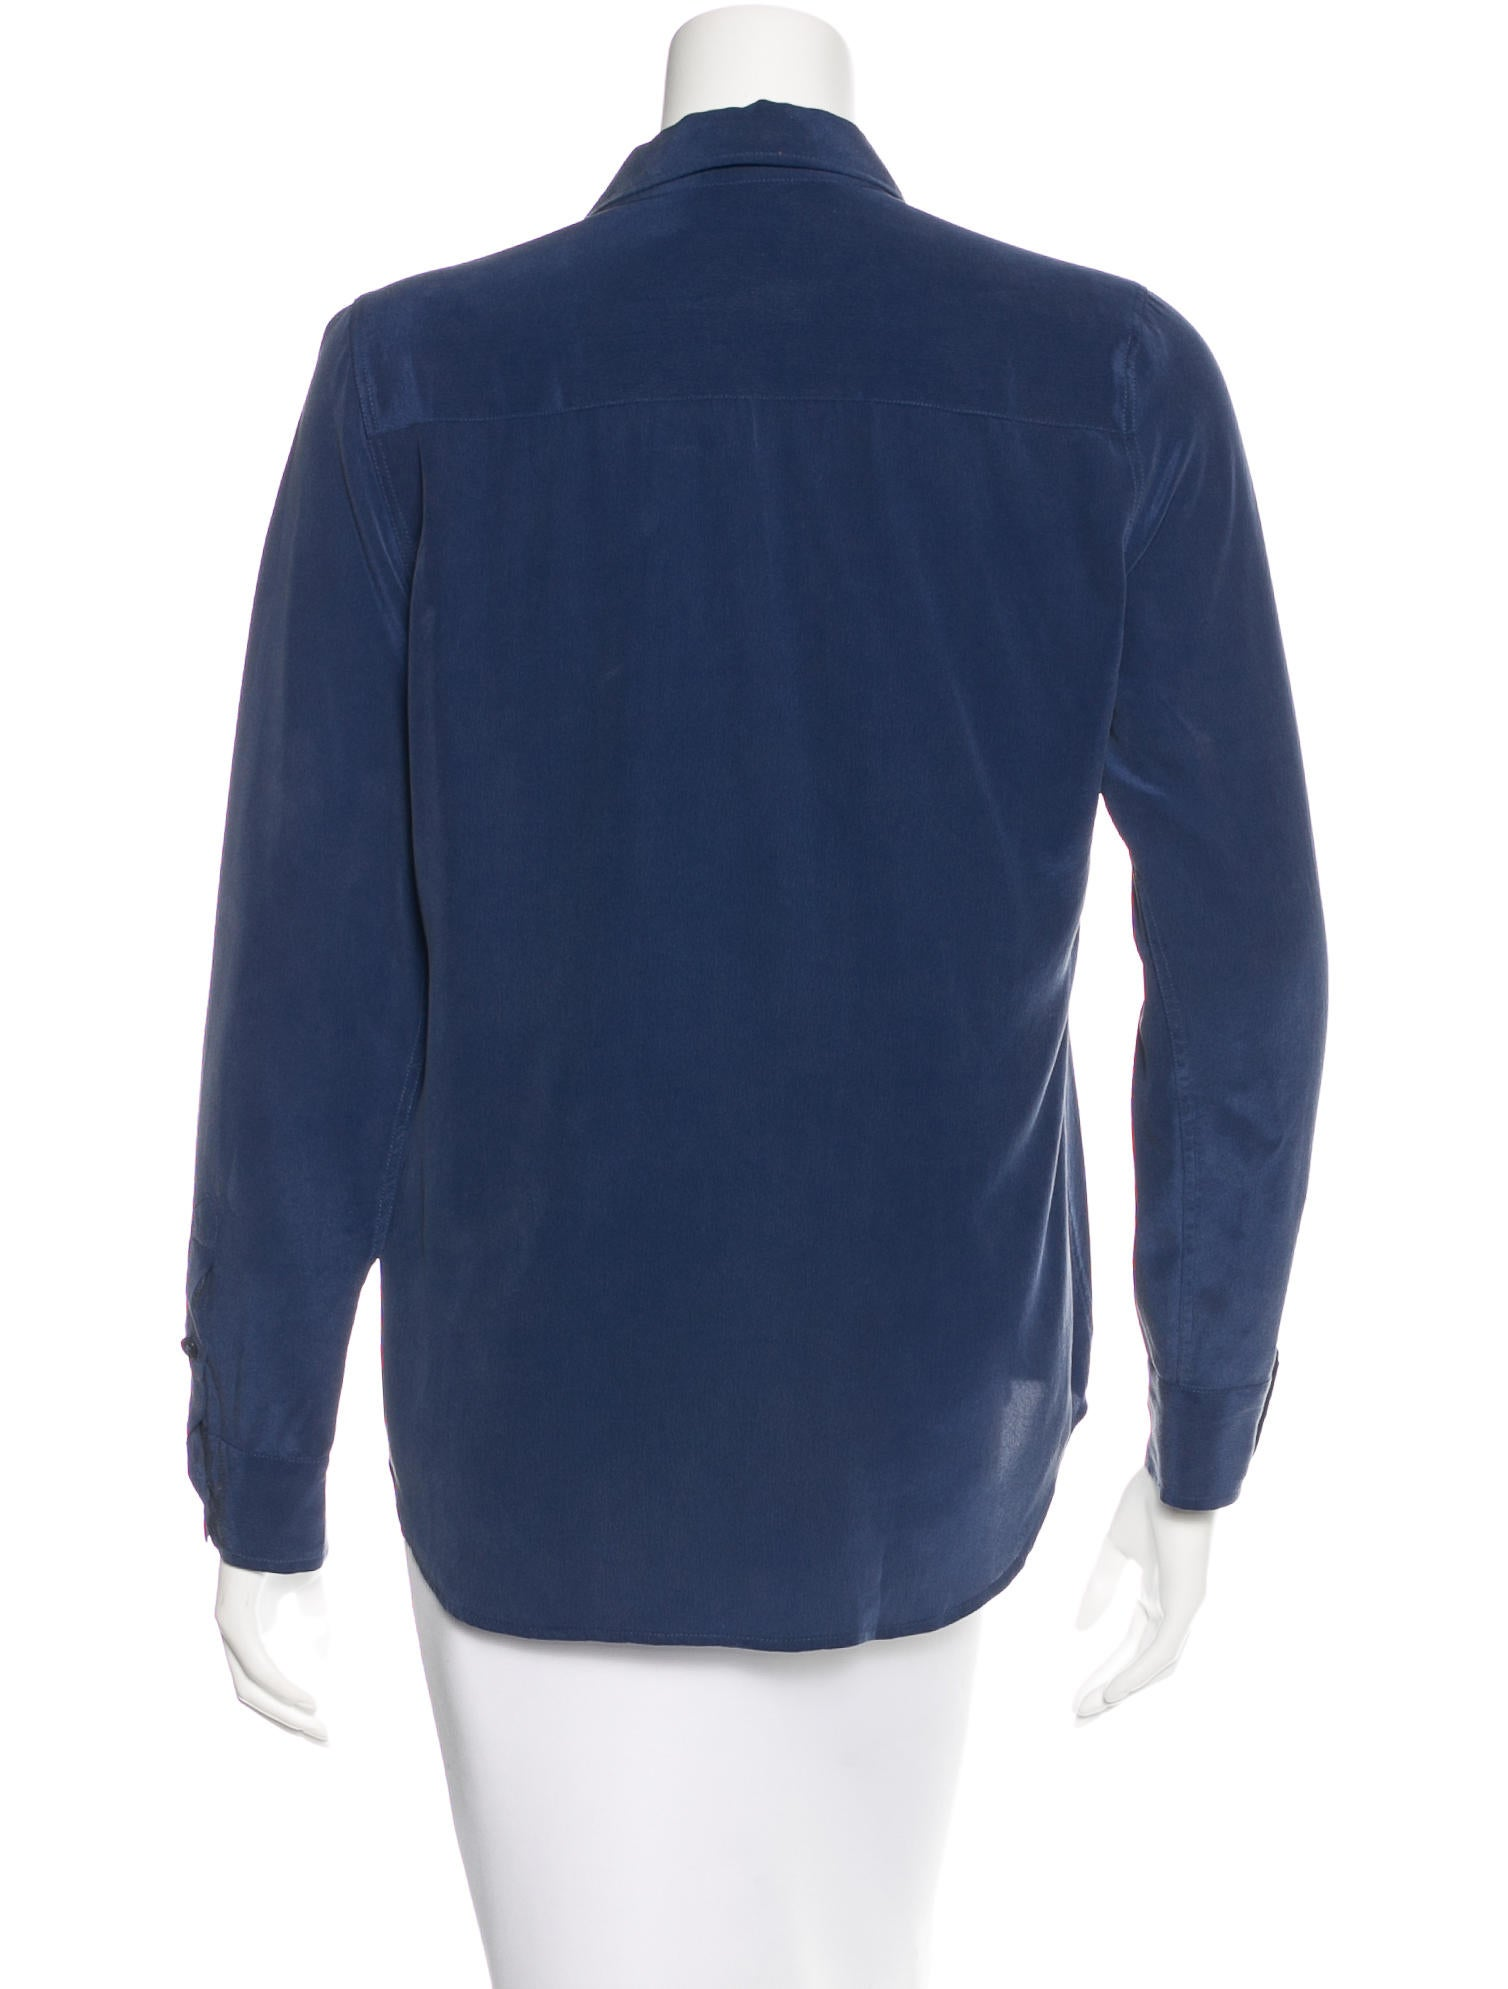 Equipment silk long sleeve shirt clothing weq31350 for Silk long sleeve shirt